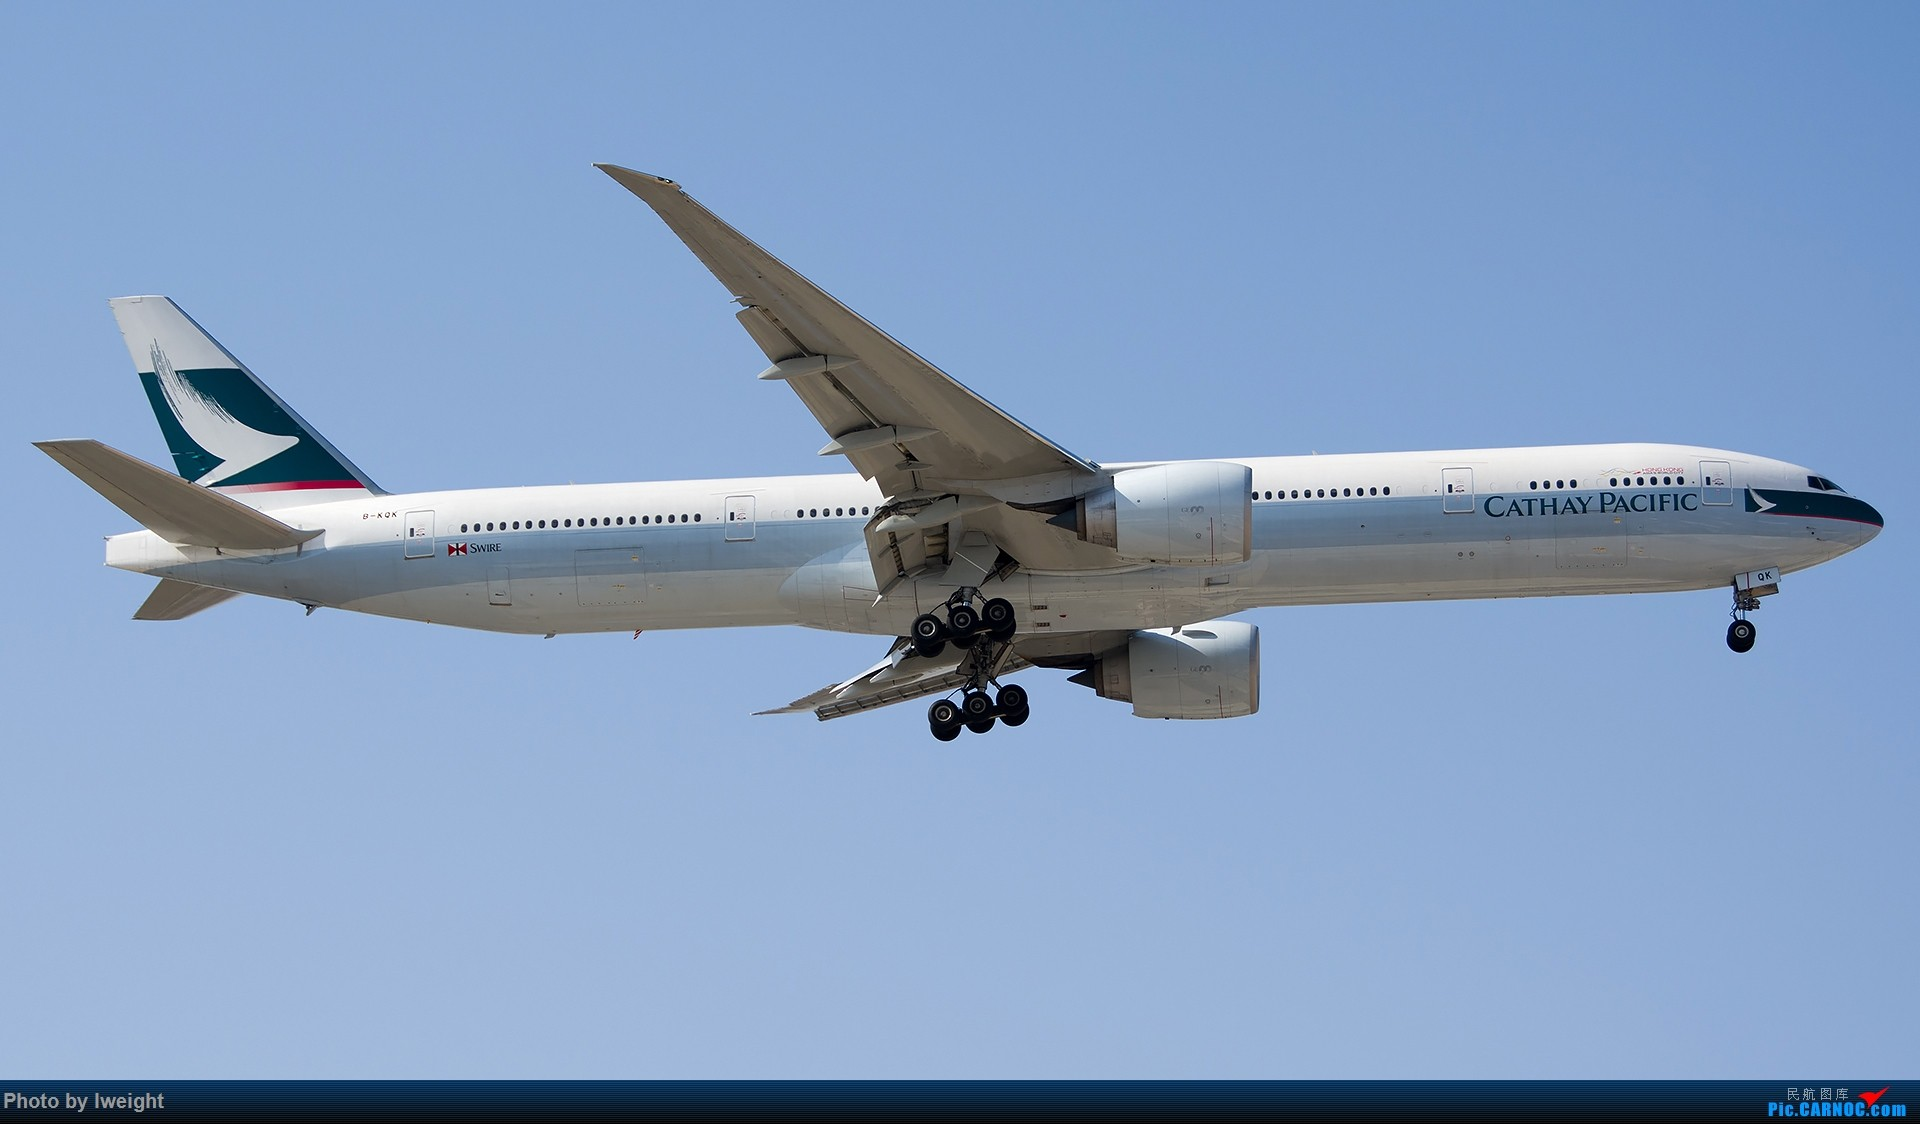 Re:[原创]羊年第一次拍机,首都机场[2015-2-23] BOEING 777-300ER B-KQK 中国北京首都国际机场